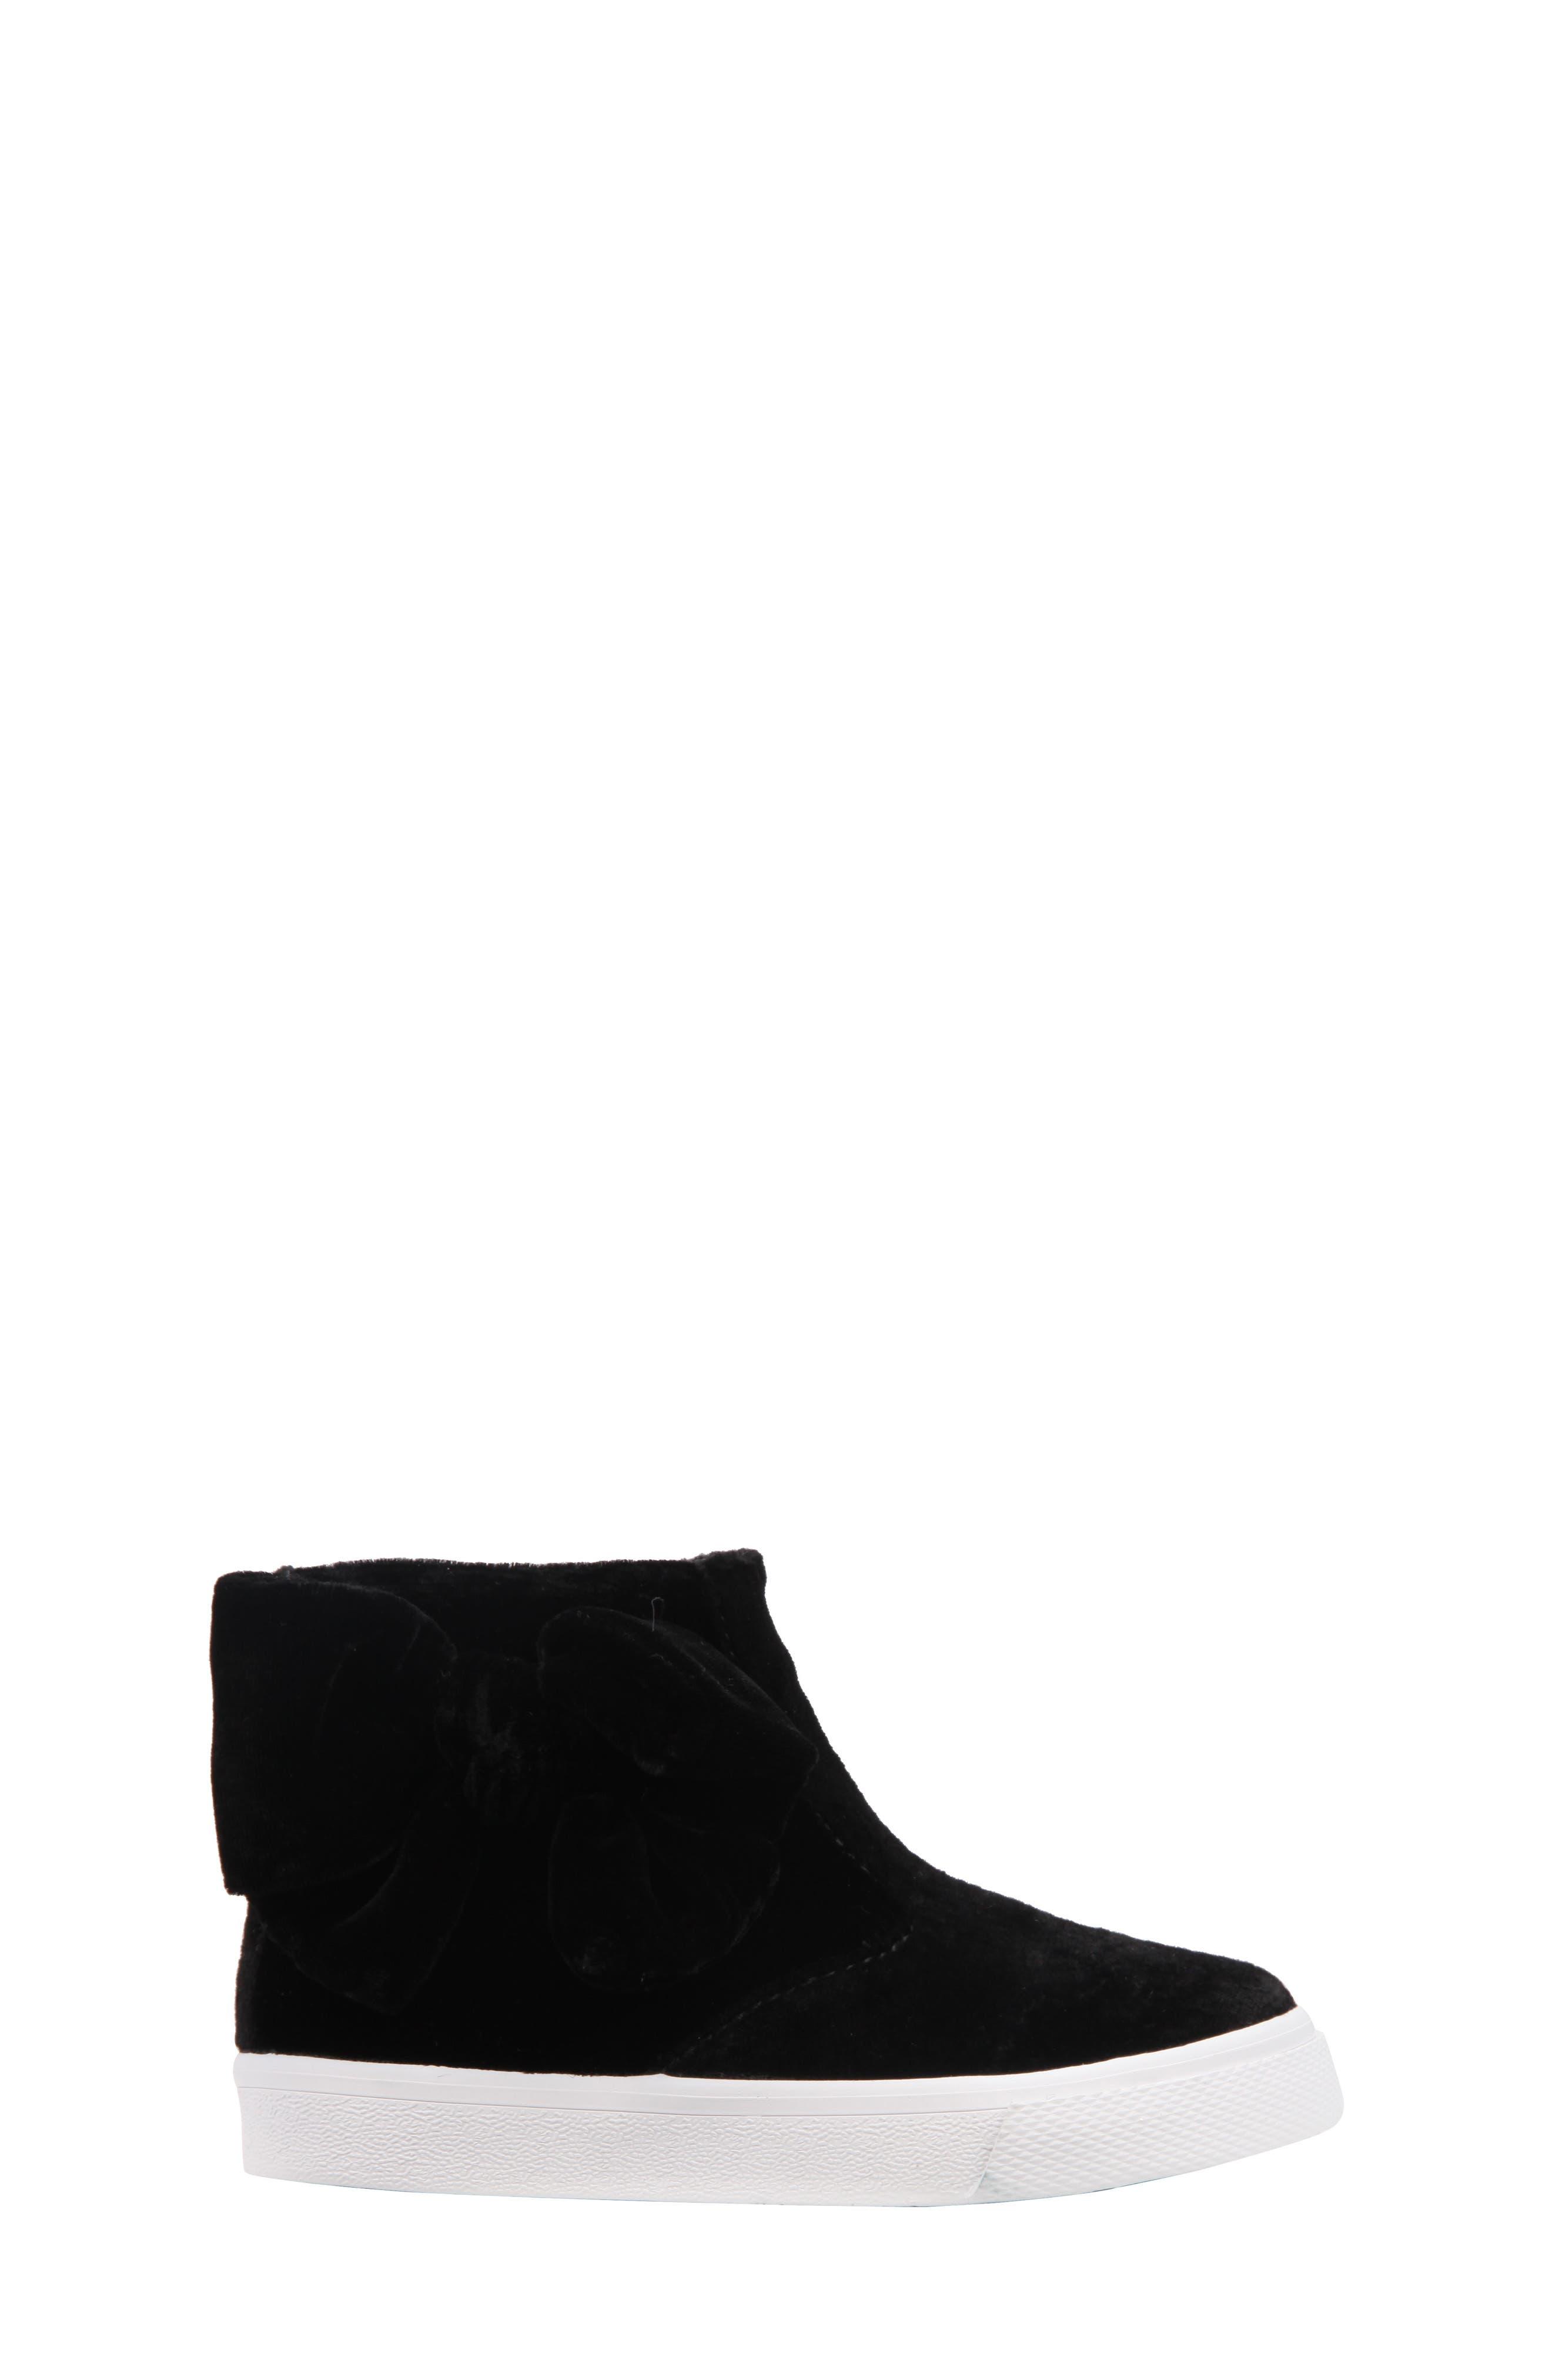 Harolyn Bow Bootie Sneaker,                             Alternate thumbnail 3, color,                             005